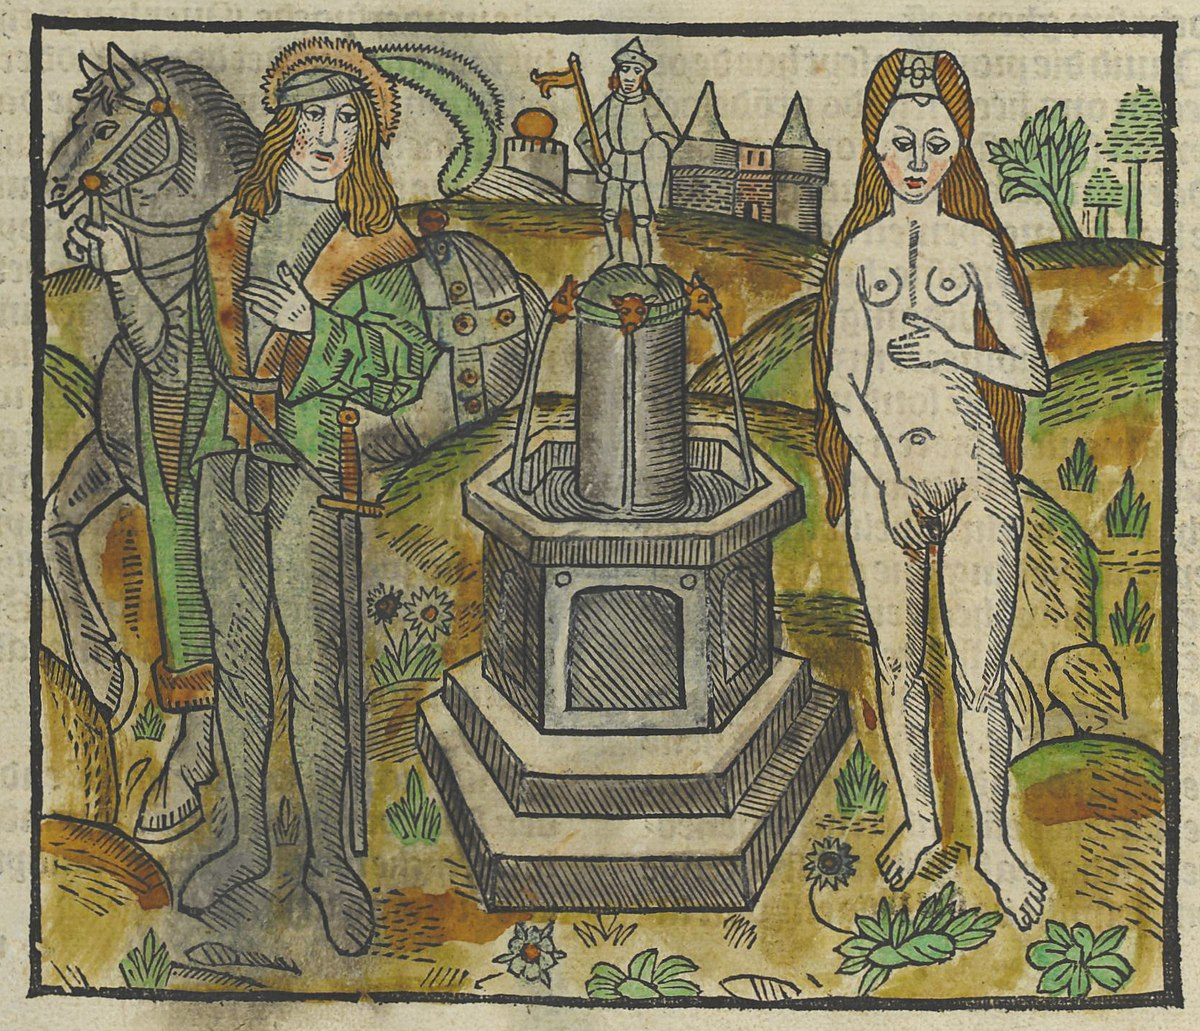 Histoire de la belle m lusine wikip dia for Histoire des jardins wikipedia